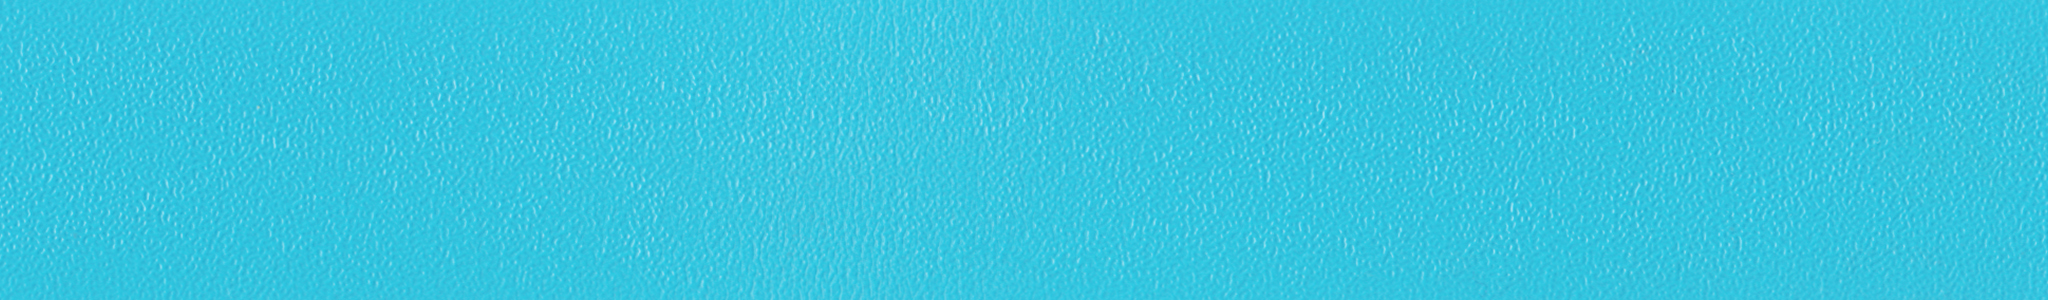 HU 155515 ABS Kante UNI Cyan Blau perl 101